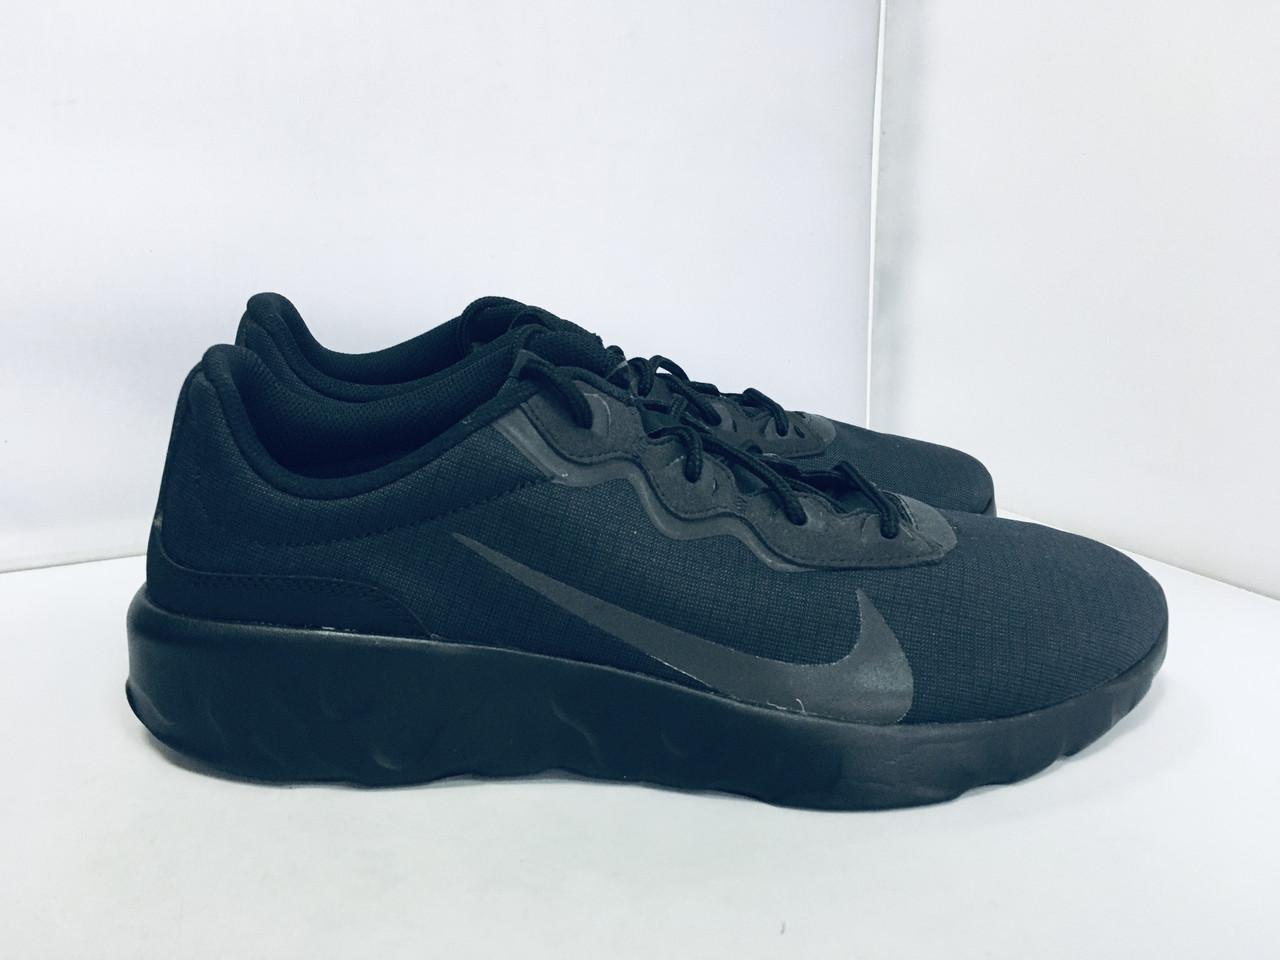 Мужские кроссовки Nike Explore Strada, 46 р